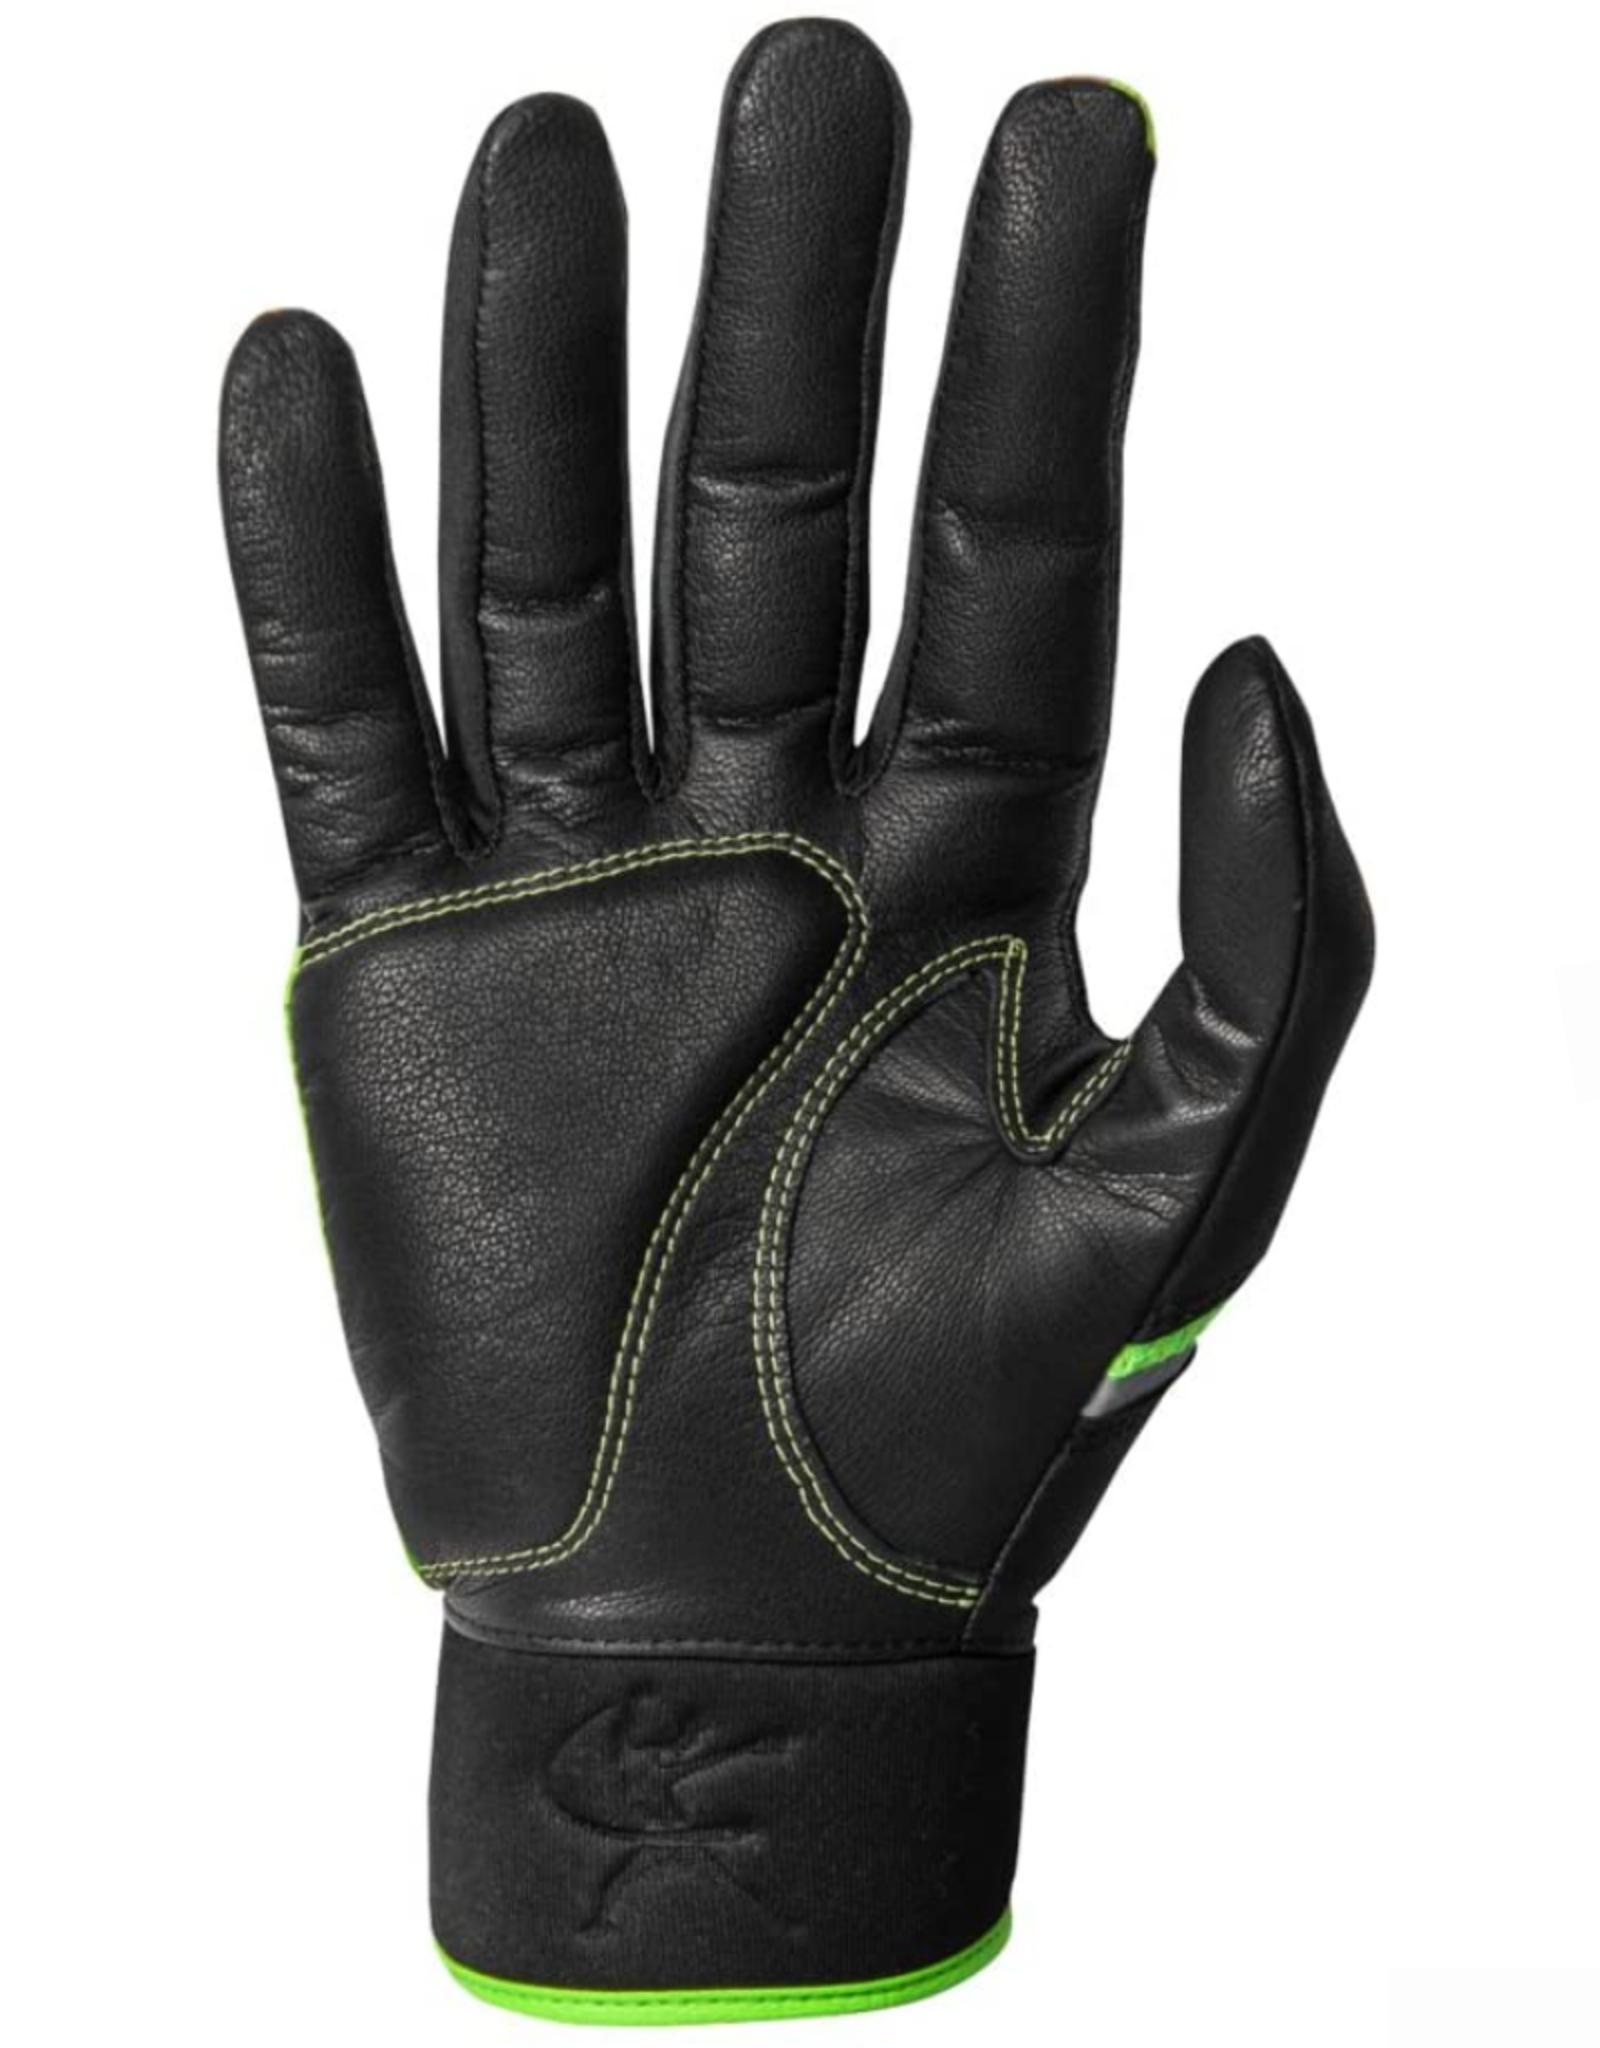 Mizuno Women's Finch Batting Glove Lime/Black